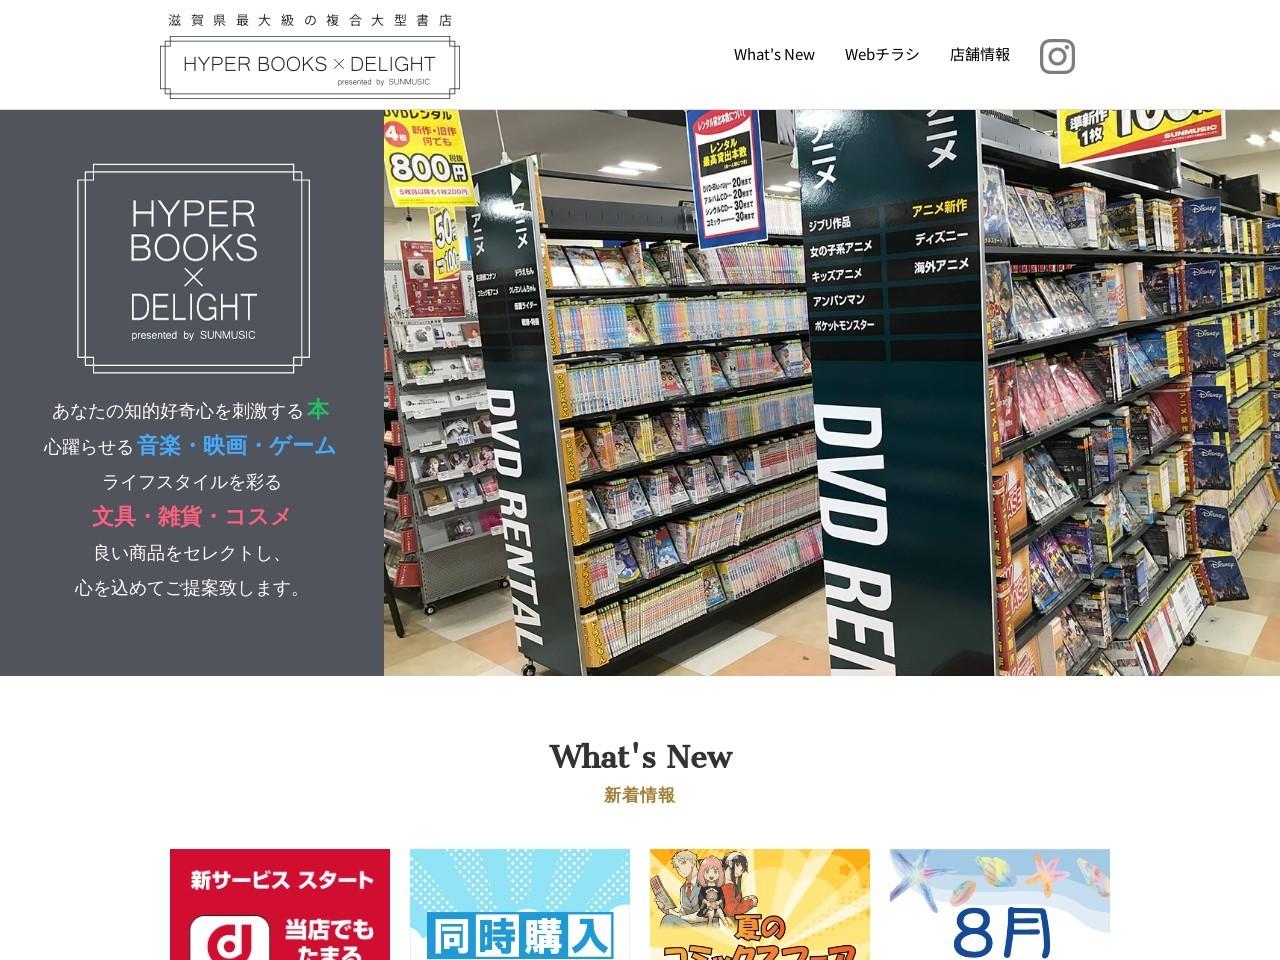 SUNMUSIC -サンミュージック- 書籍/文具・雑貨/CD・DVD・Blu-ray販売/レンタル/ゲームの総合メディアショップ